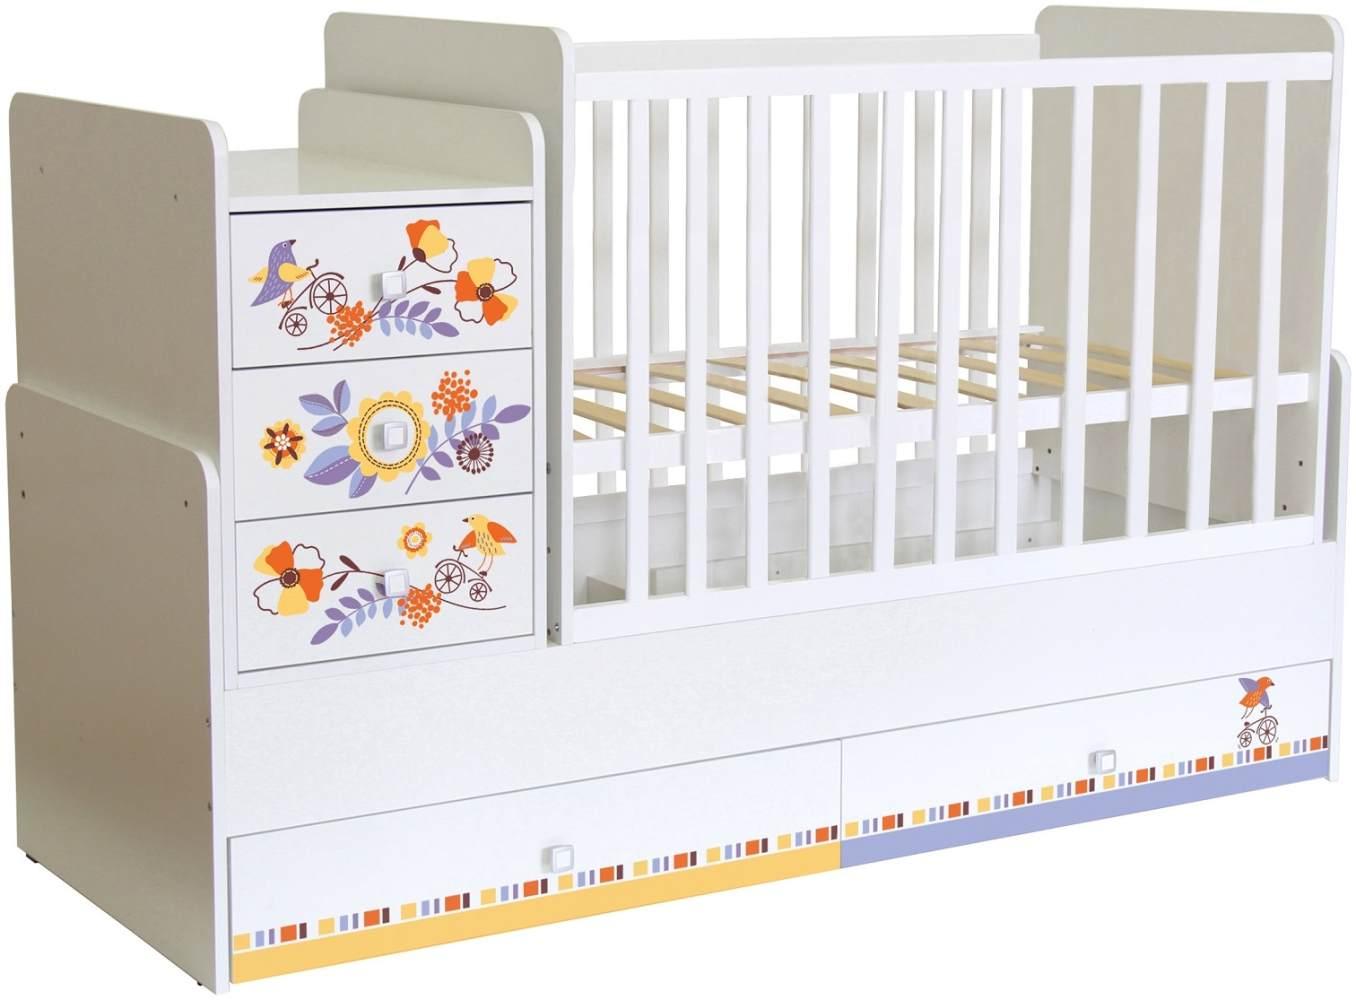 Polini Kids 'Simple 1100' Kombi-Kinderbett 60 x 120/170 cm, weiß, Floral, höhenverstellbar, mit Schaukelfunktion, inkl. Kommode Bild 1